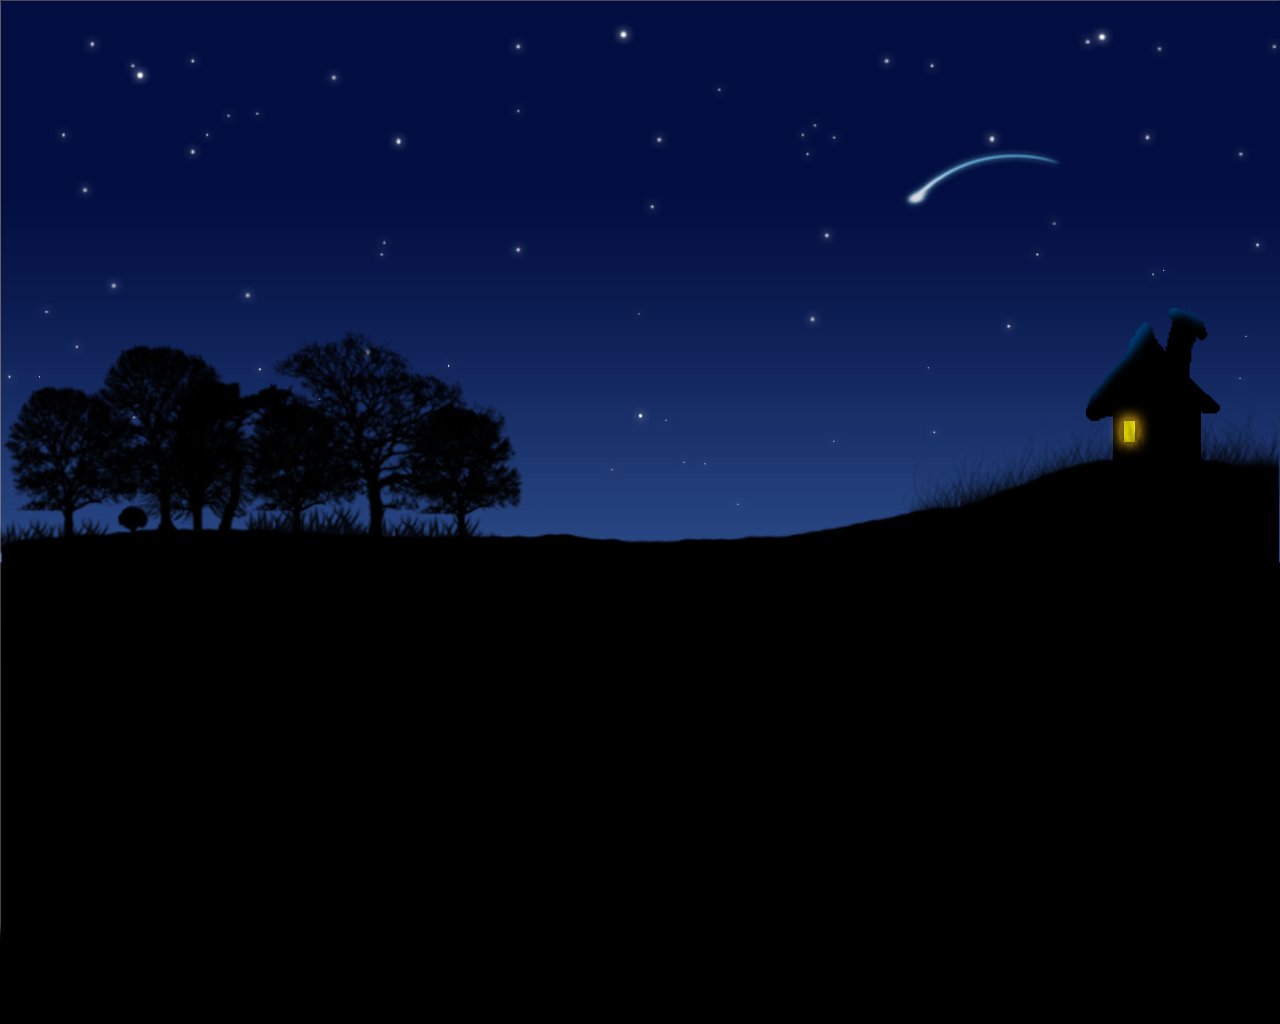 night sky wallpaper by nesh82 1280x1024